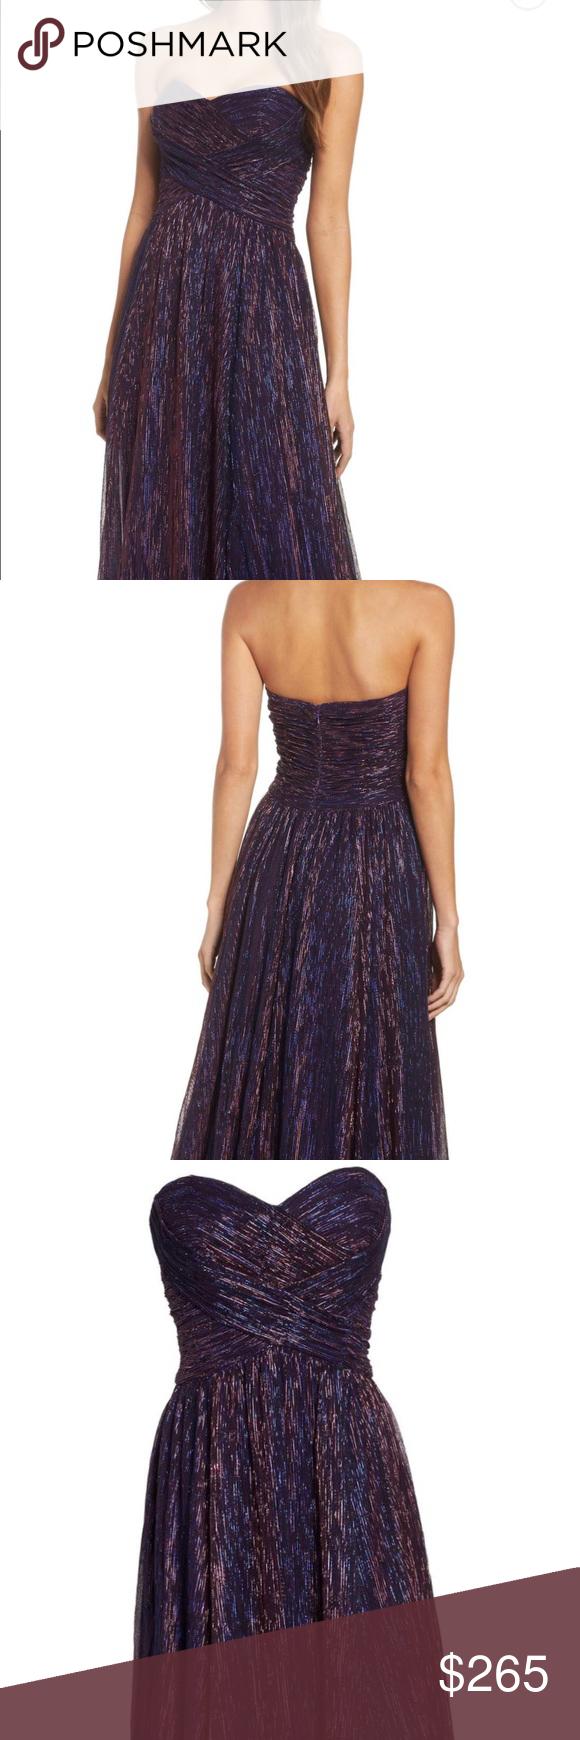 Amazing metallic promformal dresshas pockets la femme dresses